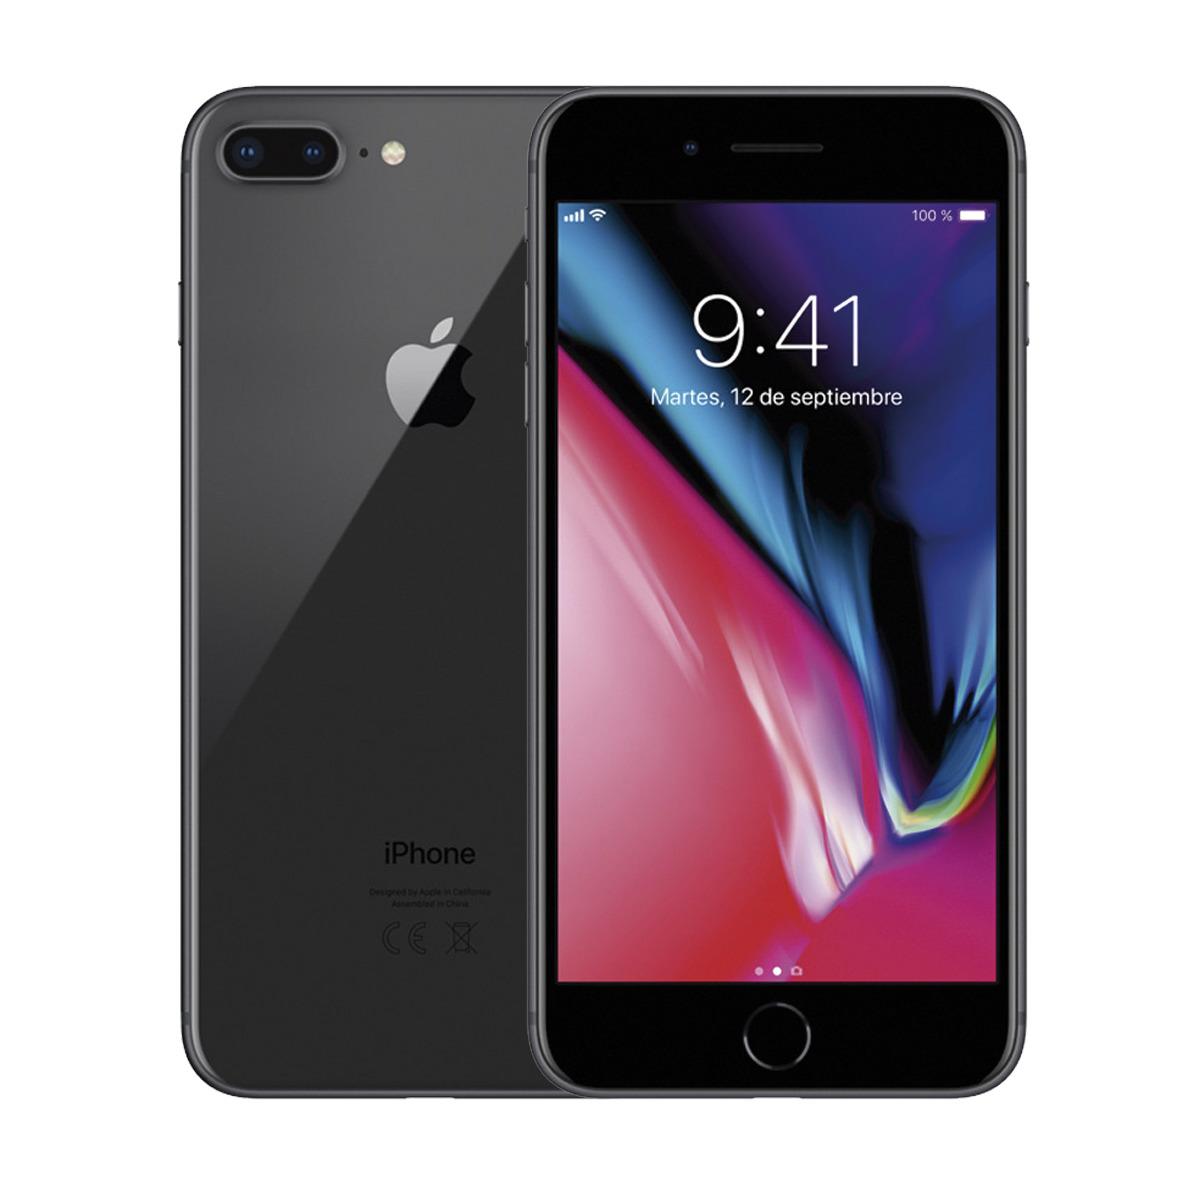 APPLE IPHONE 8 PLUS 64GB TELEFONO MOVIL LIBRE SMARTPHONE COLOR NEGRO BLACK 4G